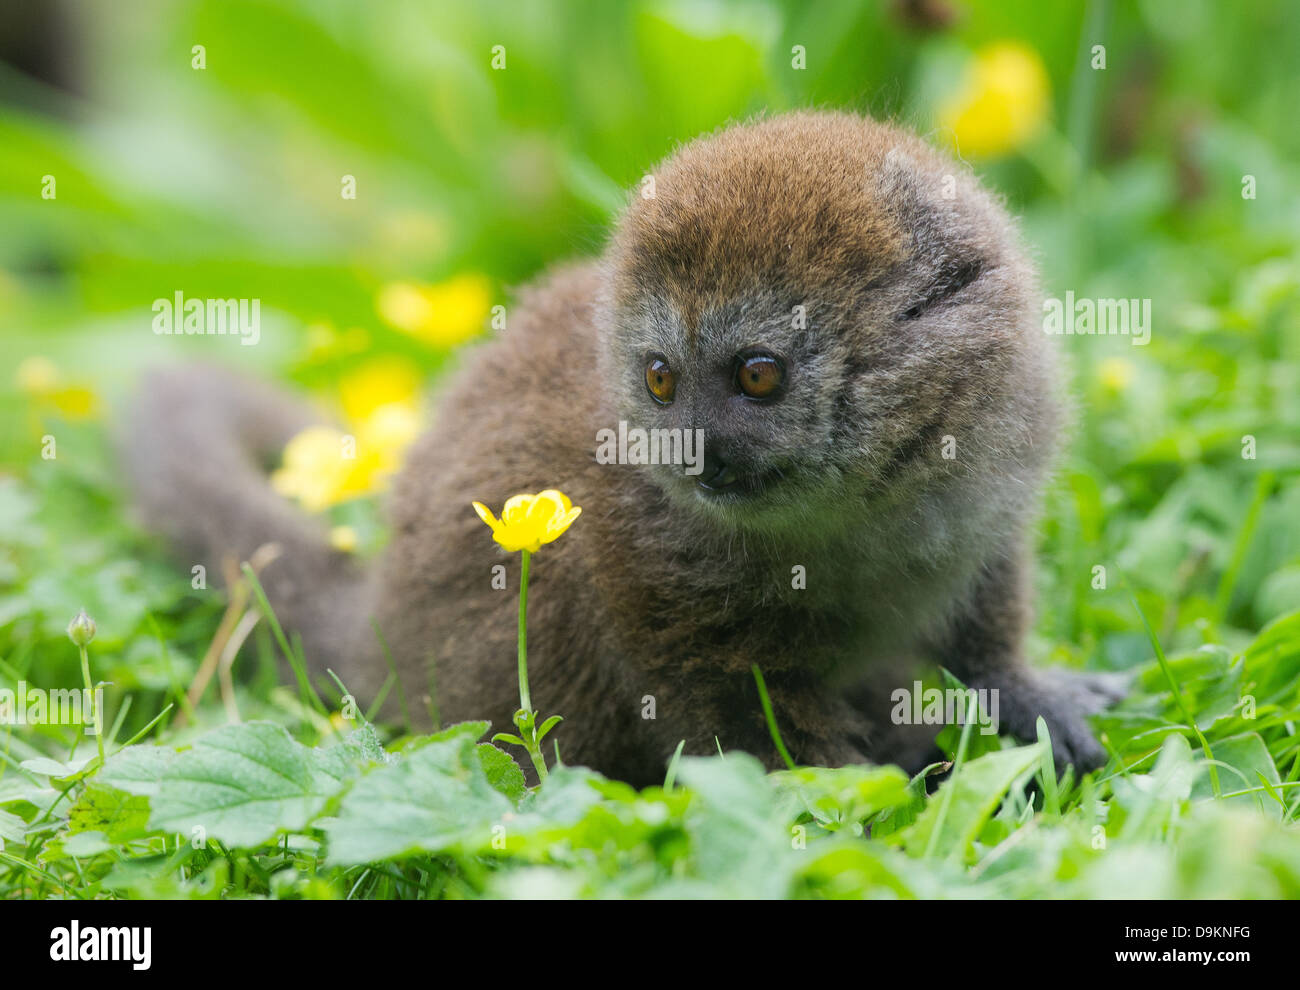 A young Alaotran Gentle Lemur (Hapalemur griseus alaotrensis) - Stock Image